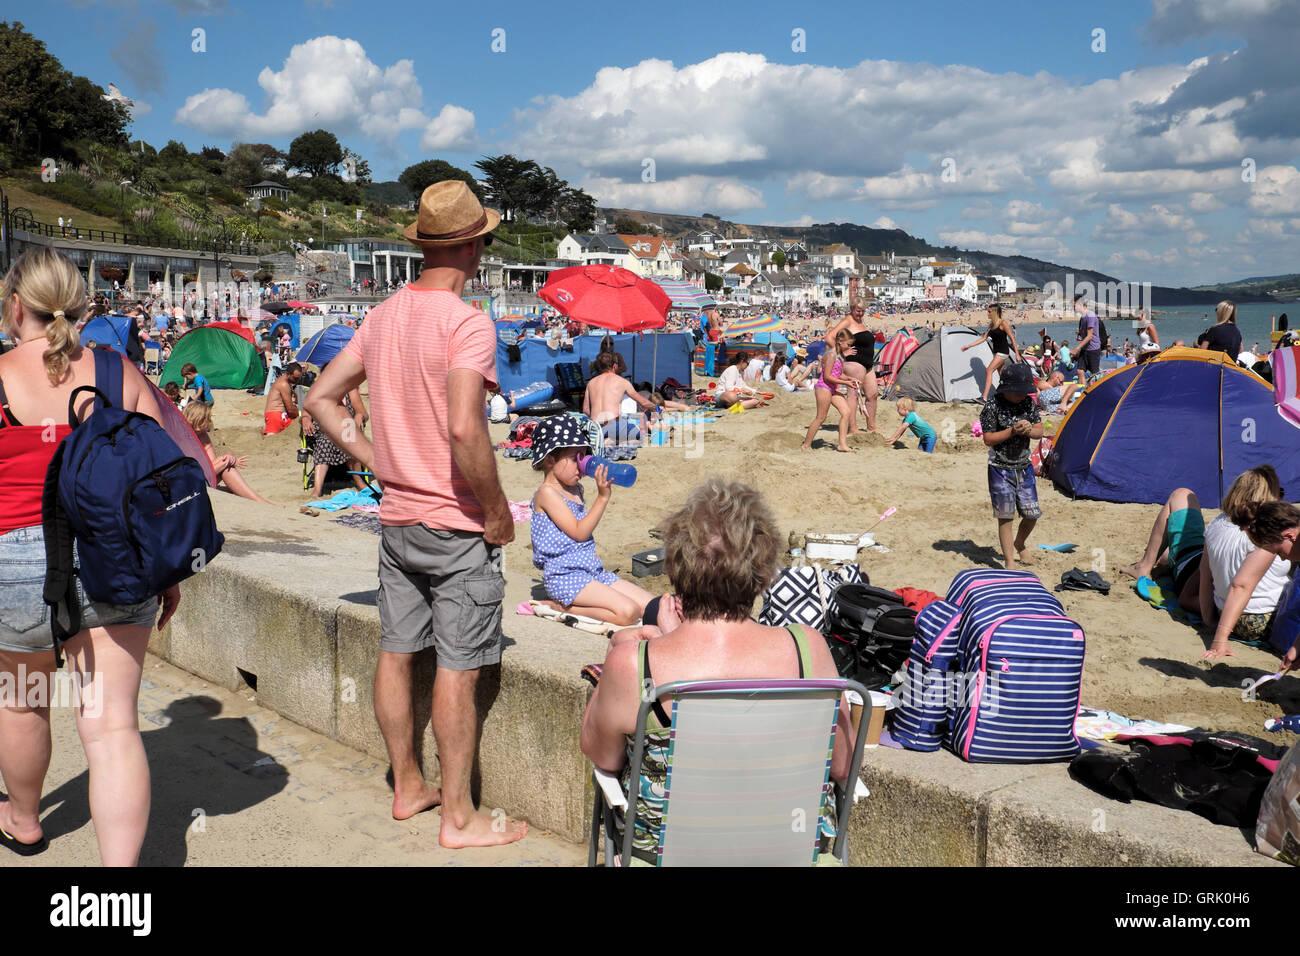 People in summer on the beach at Lyme Regis, Dorset, England UK  KATHY DEWITT - Stock Image